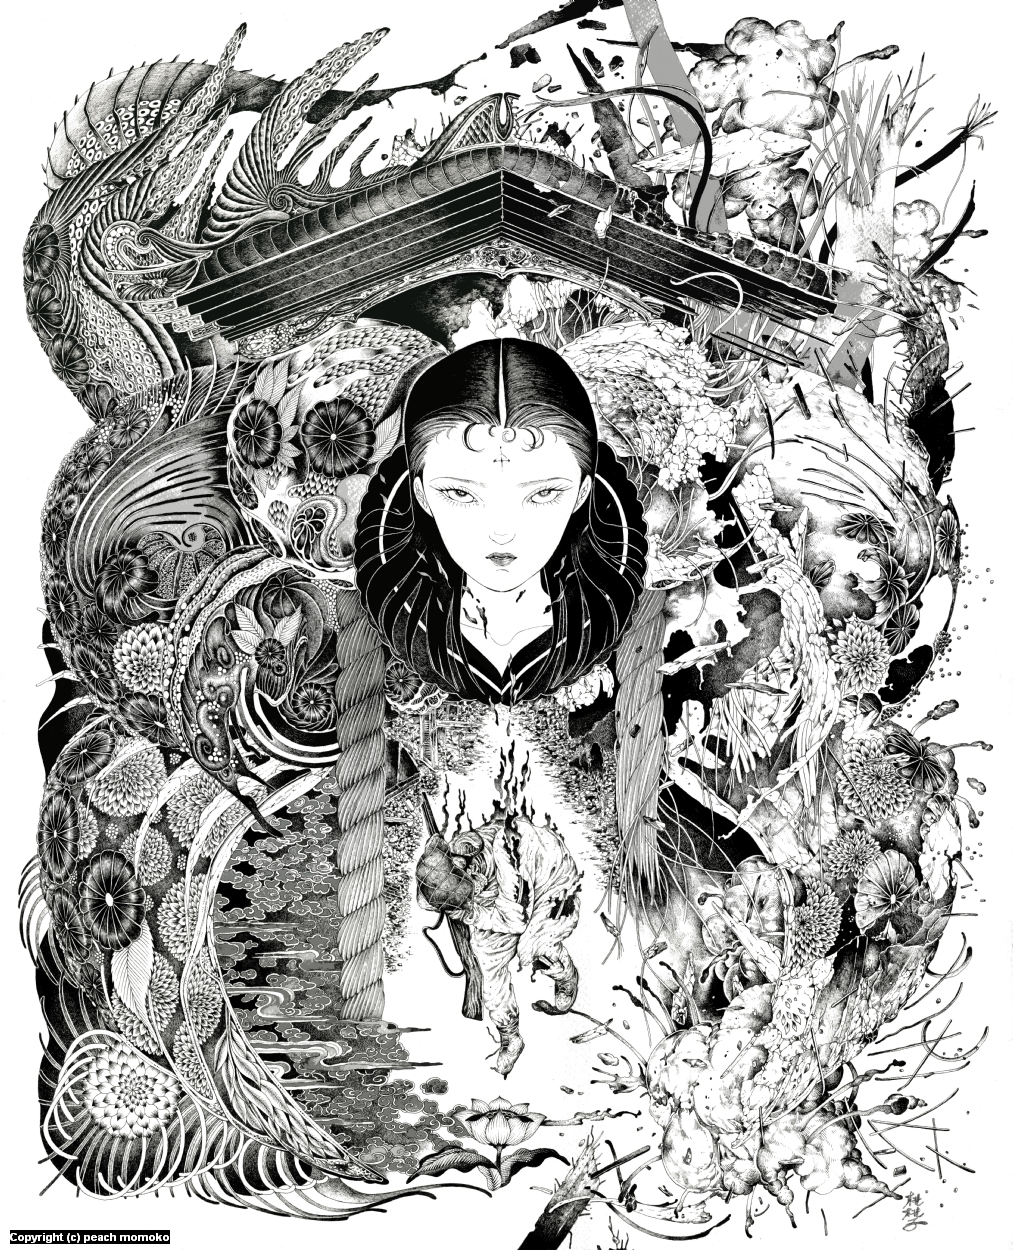 Hakai & Saisei Artwork by MoMoKo Peach